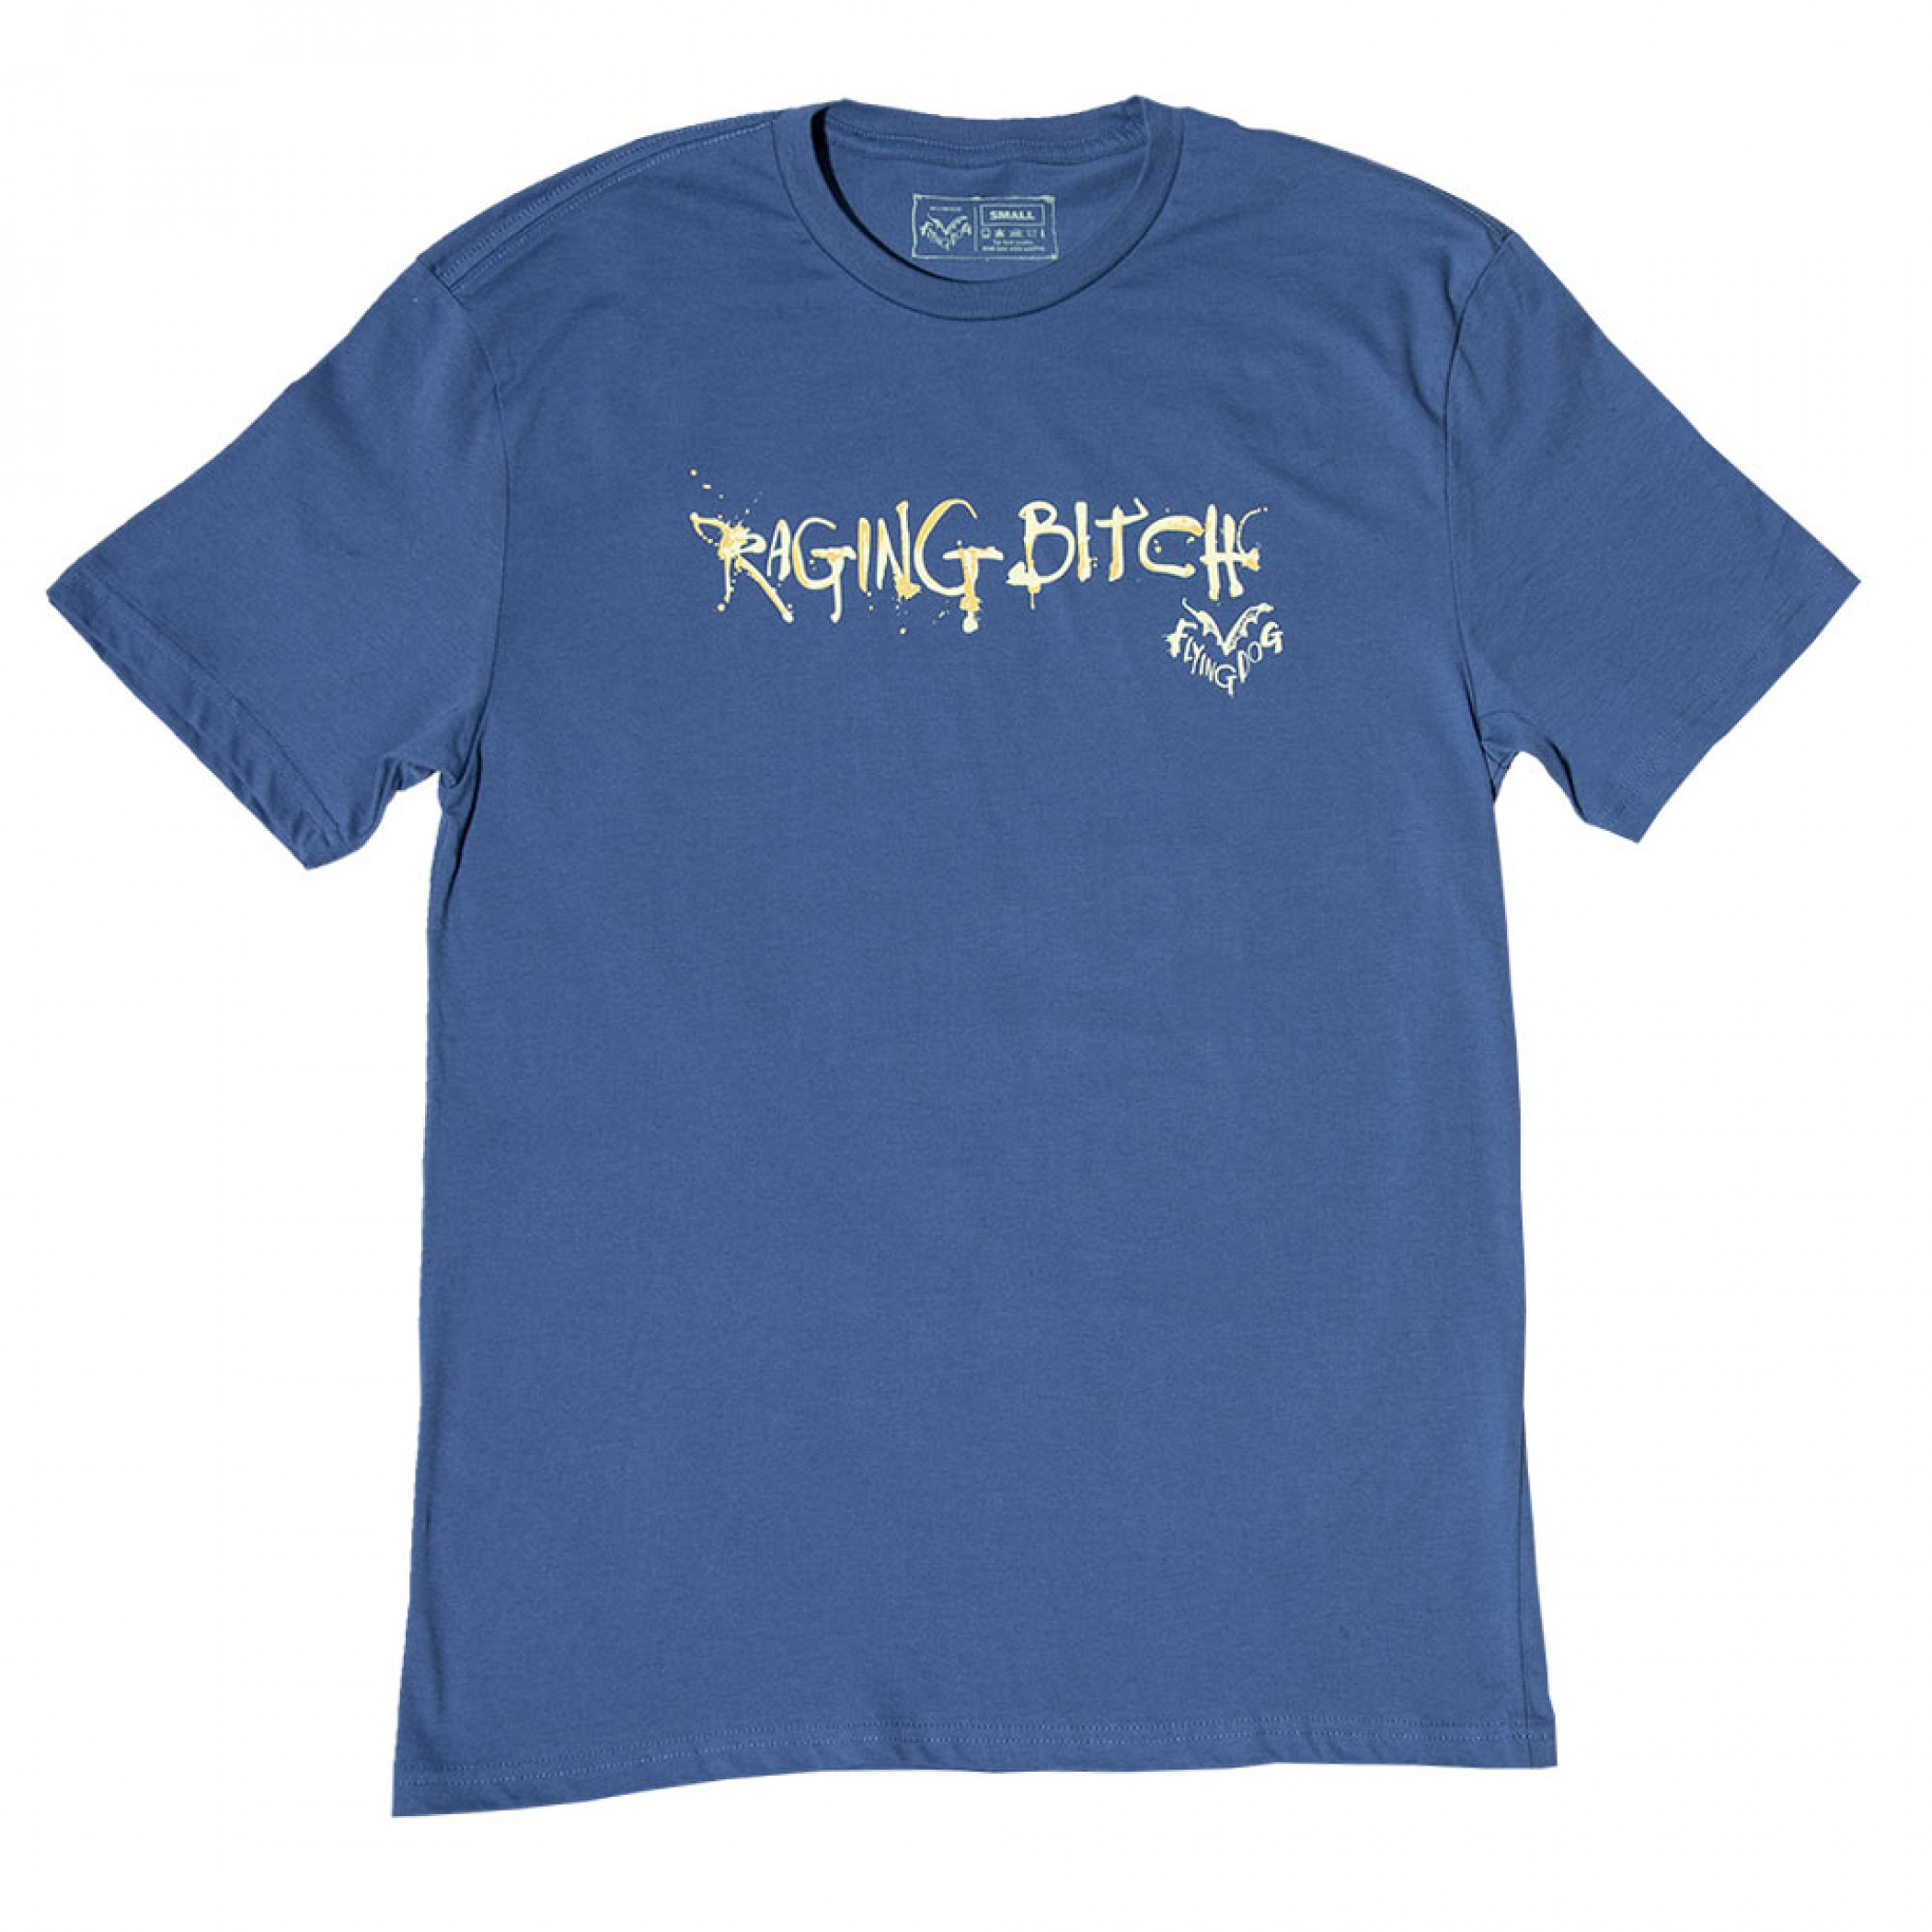 Flying Dog Raging Bitch Blue T-Shirt